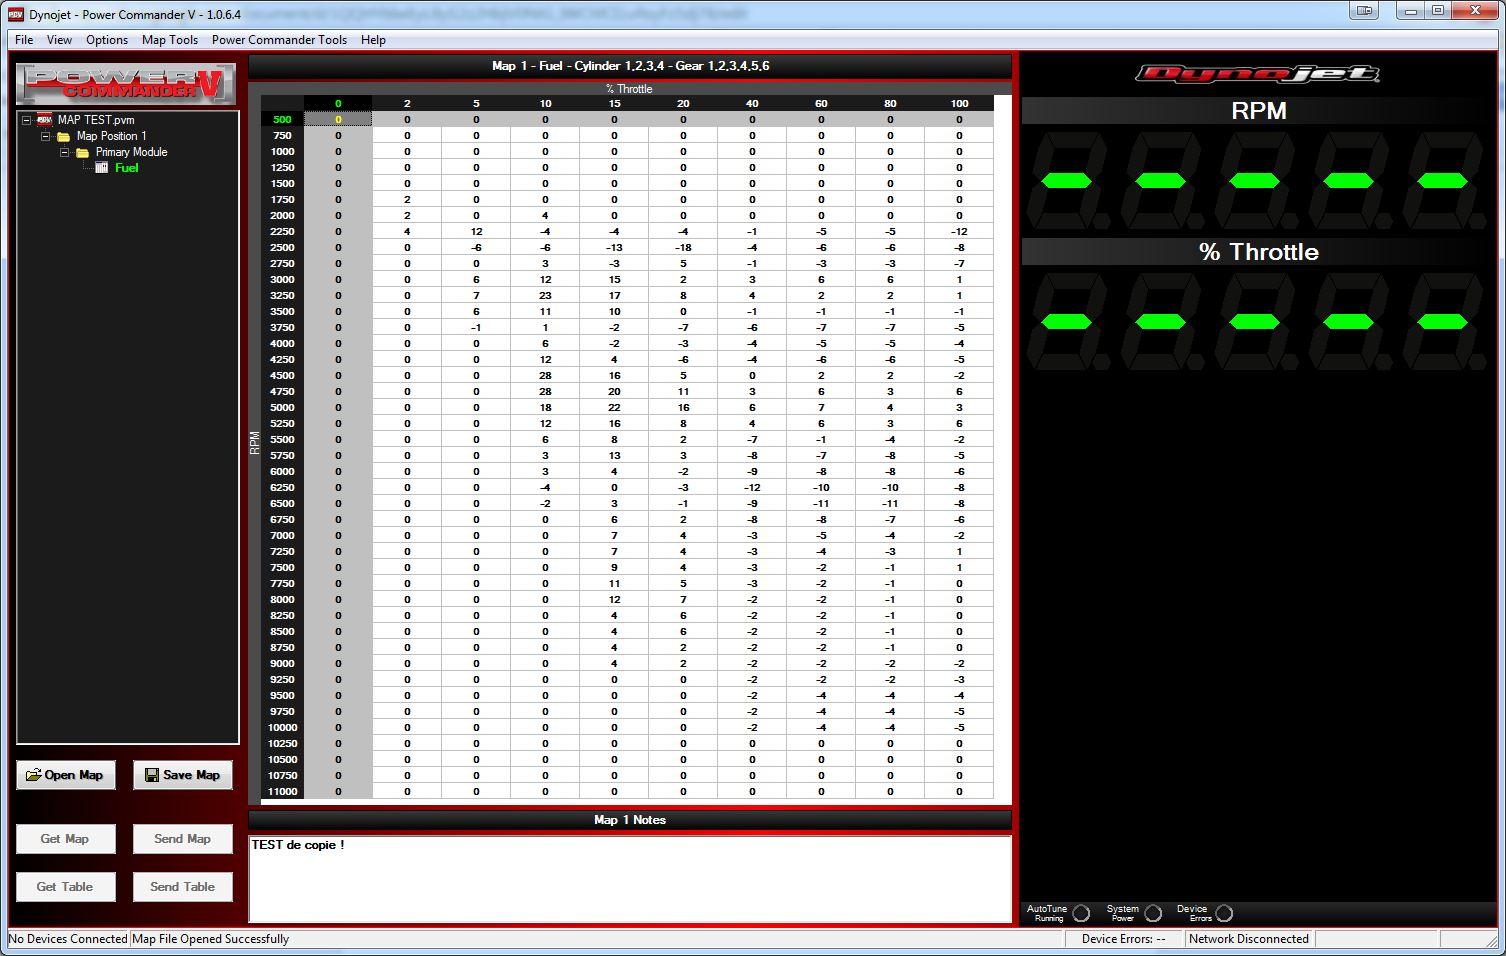 Rendre le Dynojet PC5 de YZF 125 Compatible avec le WRX 125 YURp4v49iF5AsmmYzg_Nwj4x6ScsDZPbTOgwsi_CDndrryOd4w1AV3P2gBCki0zj_oGXJvs6-RLXF_7LeFEJ3UDO_IuMRwnQjeNBeZa4uhIru2YY-zAMM94RCVX8N-Oe_Q